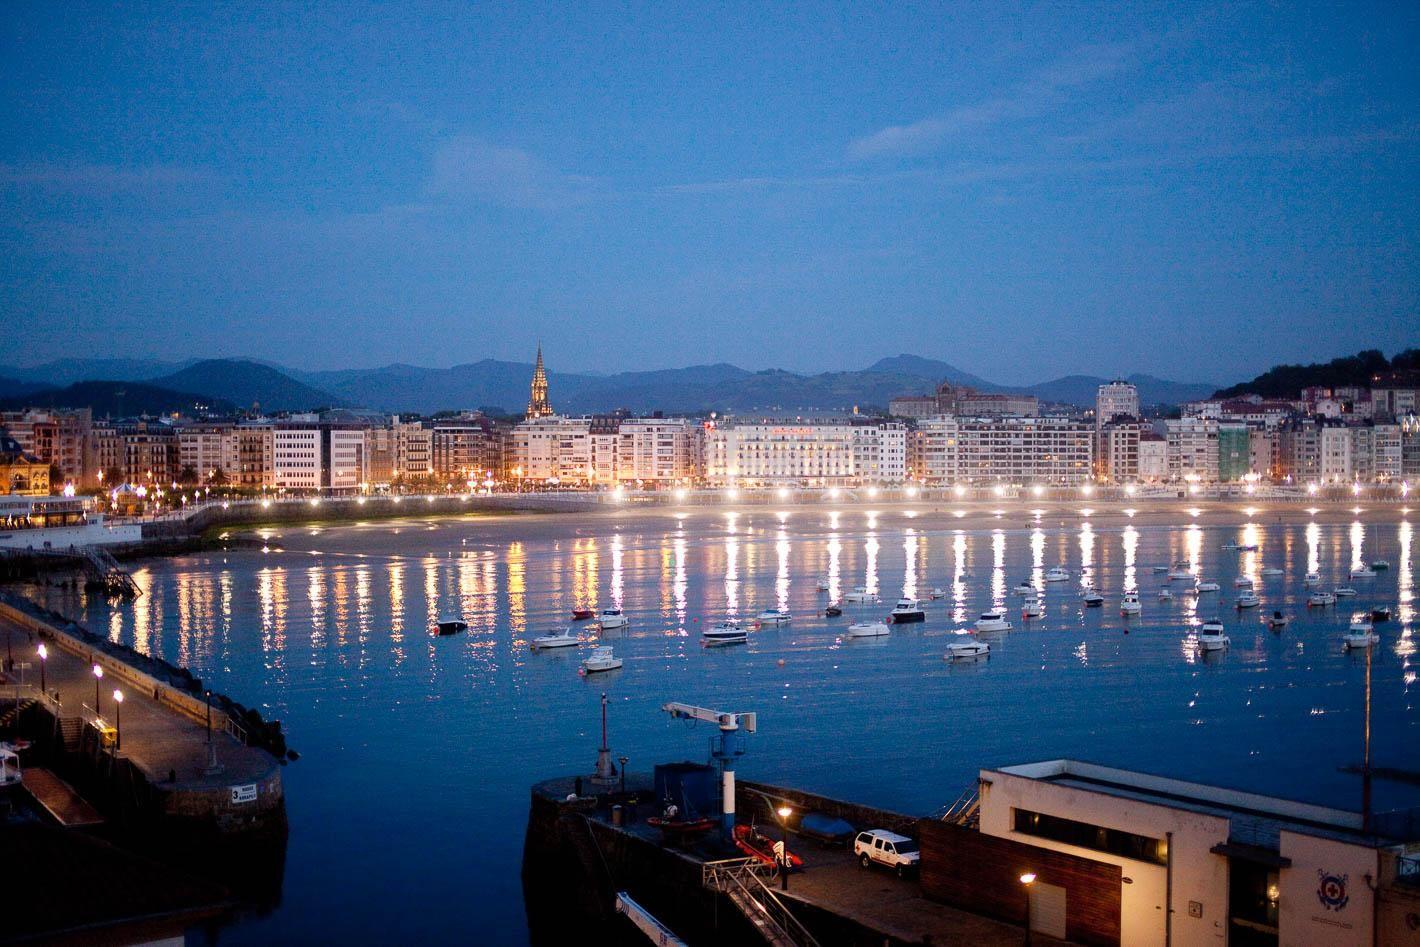 Mondon valinnat 2015: San Sebastián. Herkuttelijan ykköskohde on Espanjan San Sebastián.